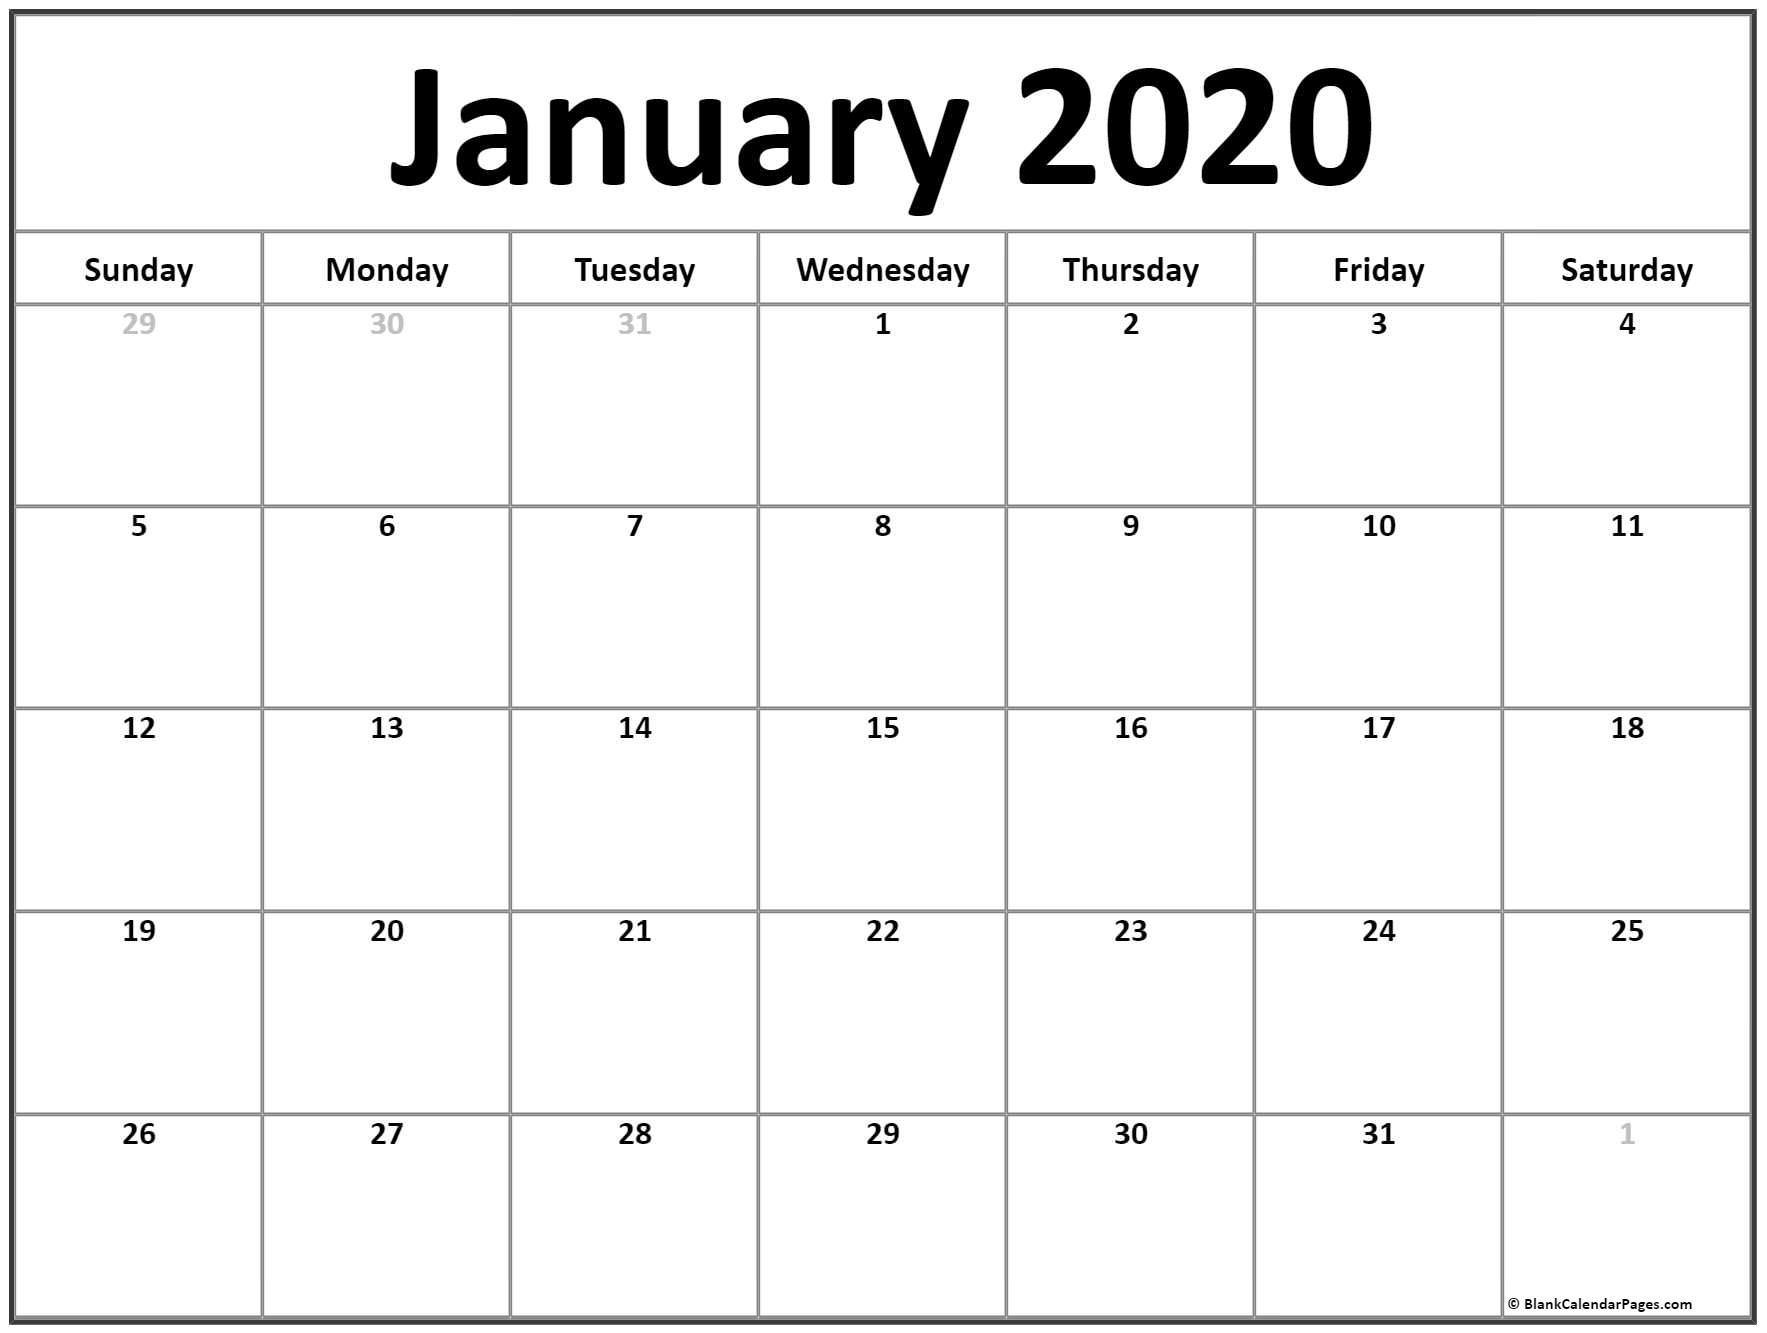 Free January 2020 Printable Calendar - Create Your Editable-Show Me A Calendar Of January 2020